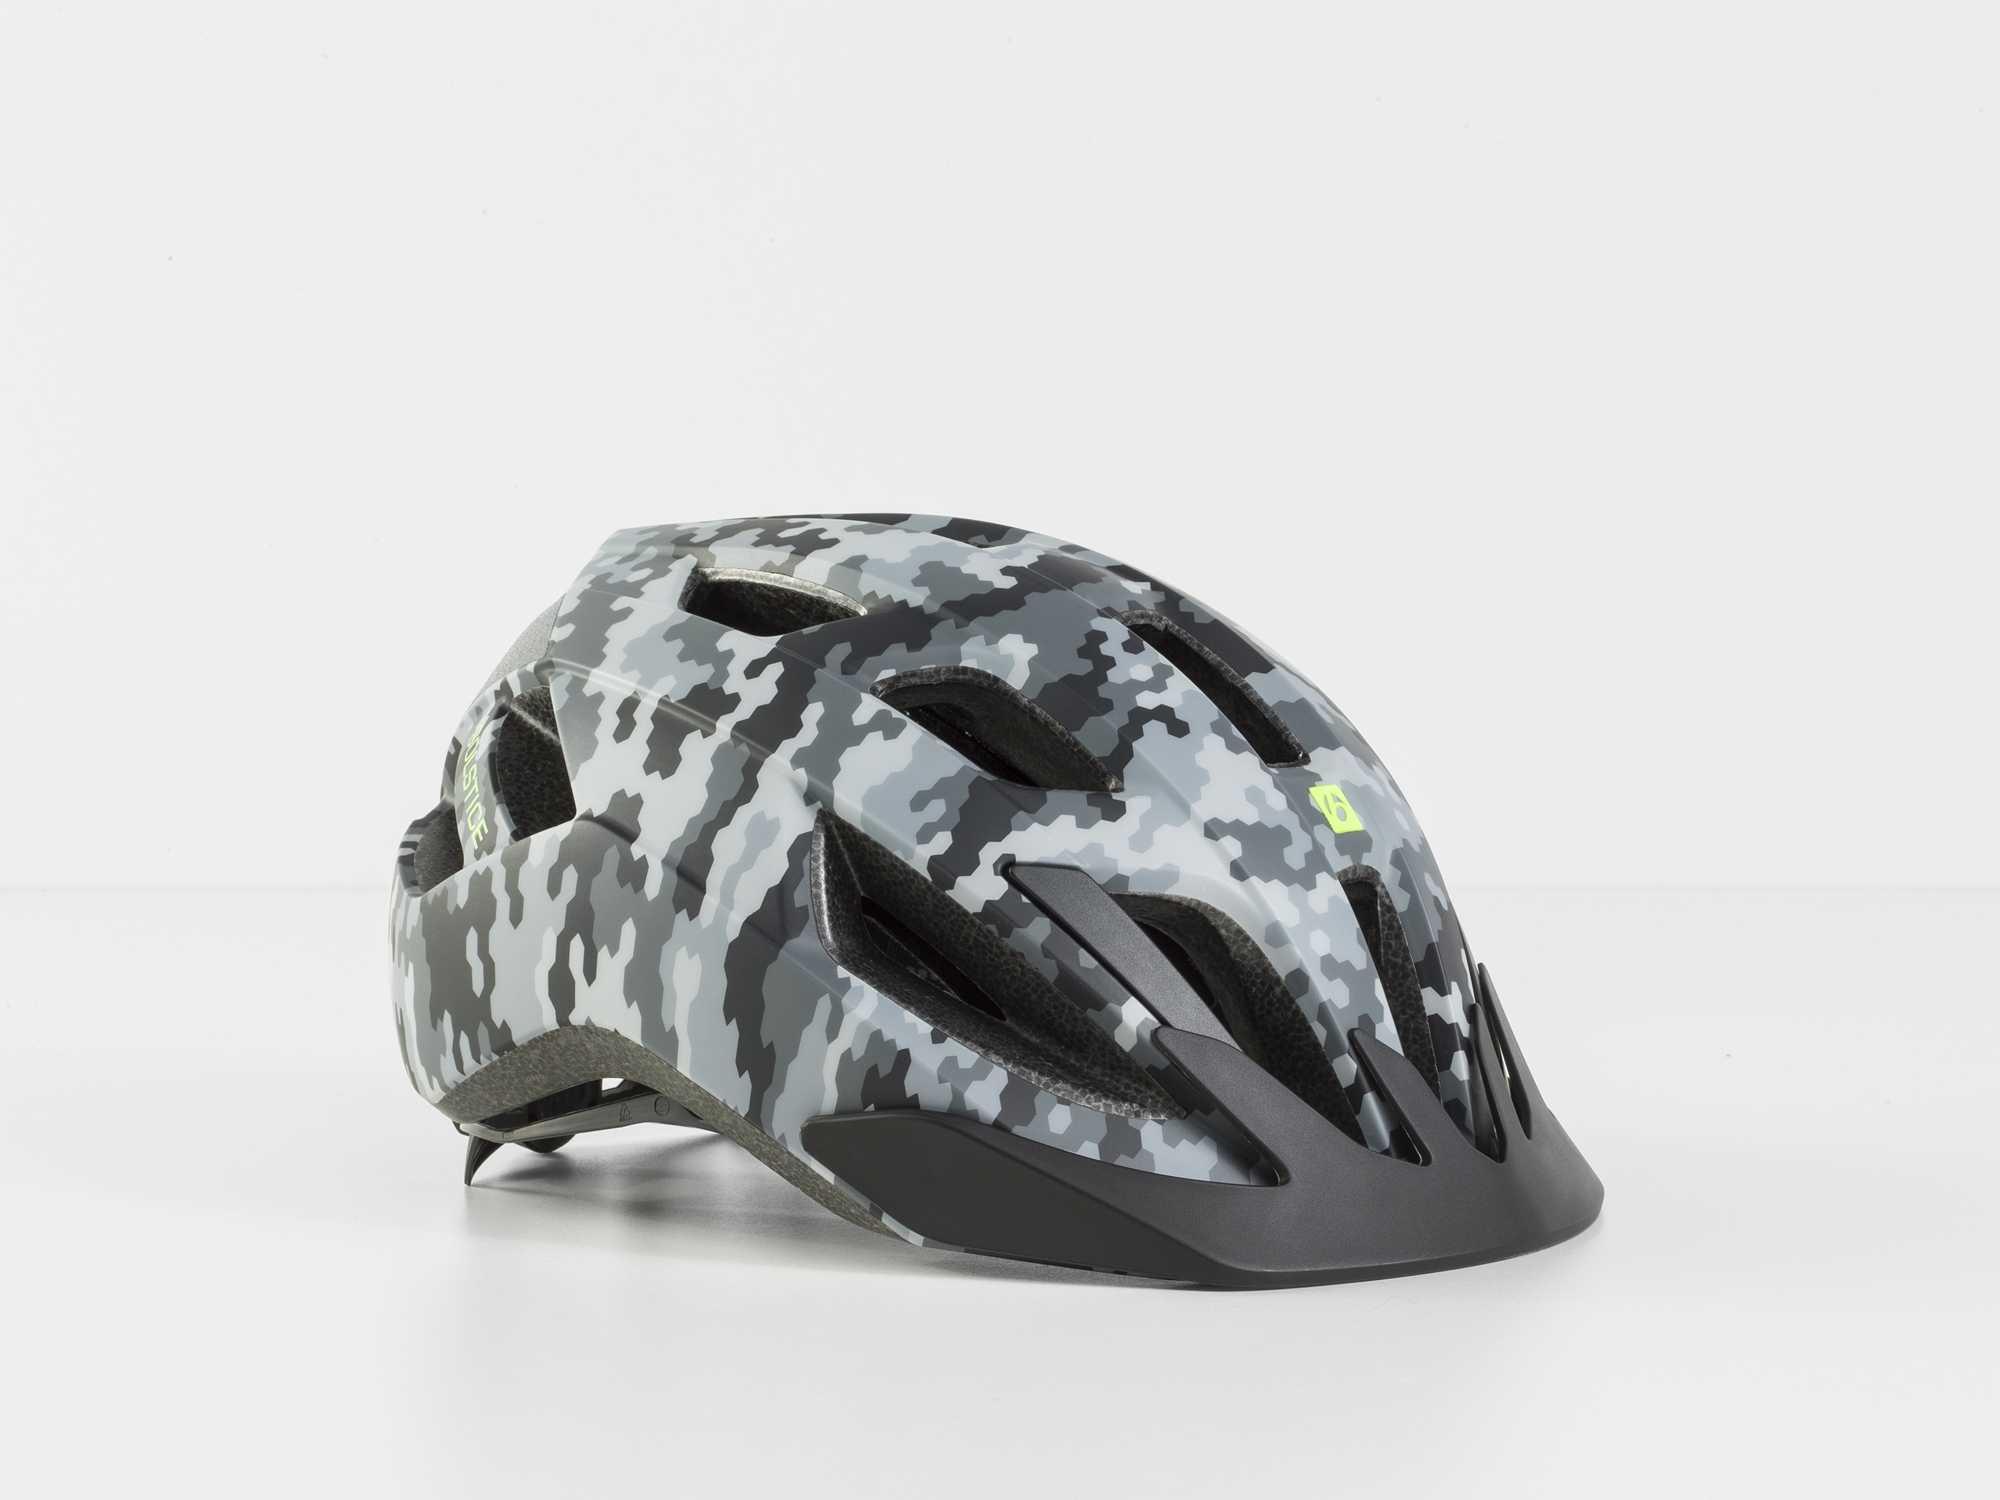 Hjälm Bontrager Solstice MIPS Youth grå camo | Helmets